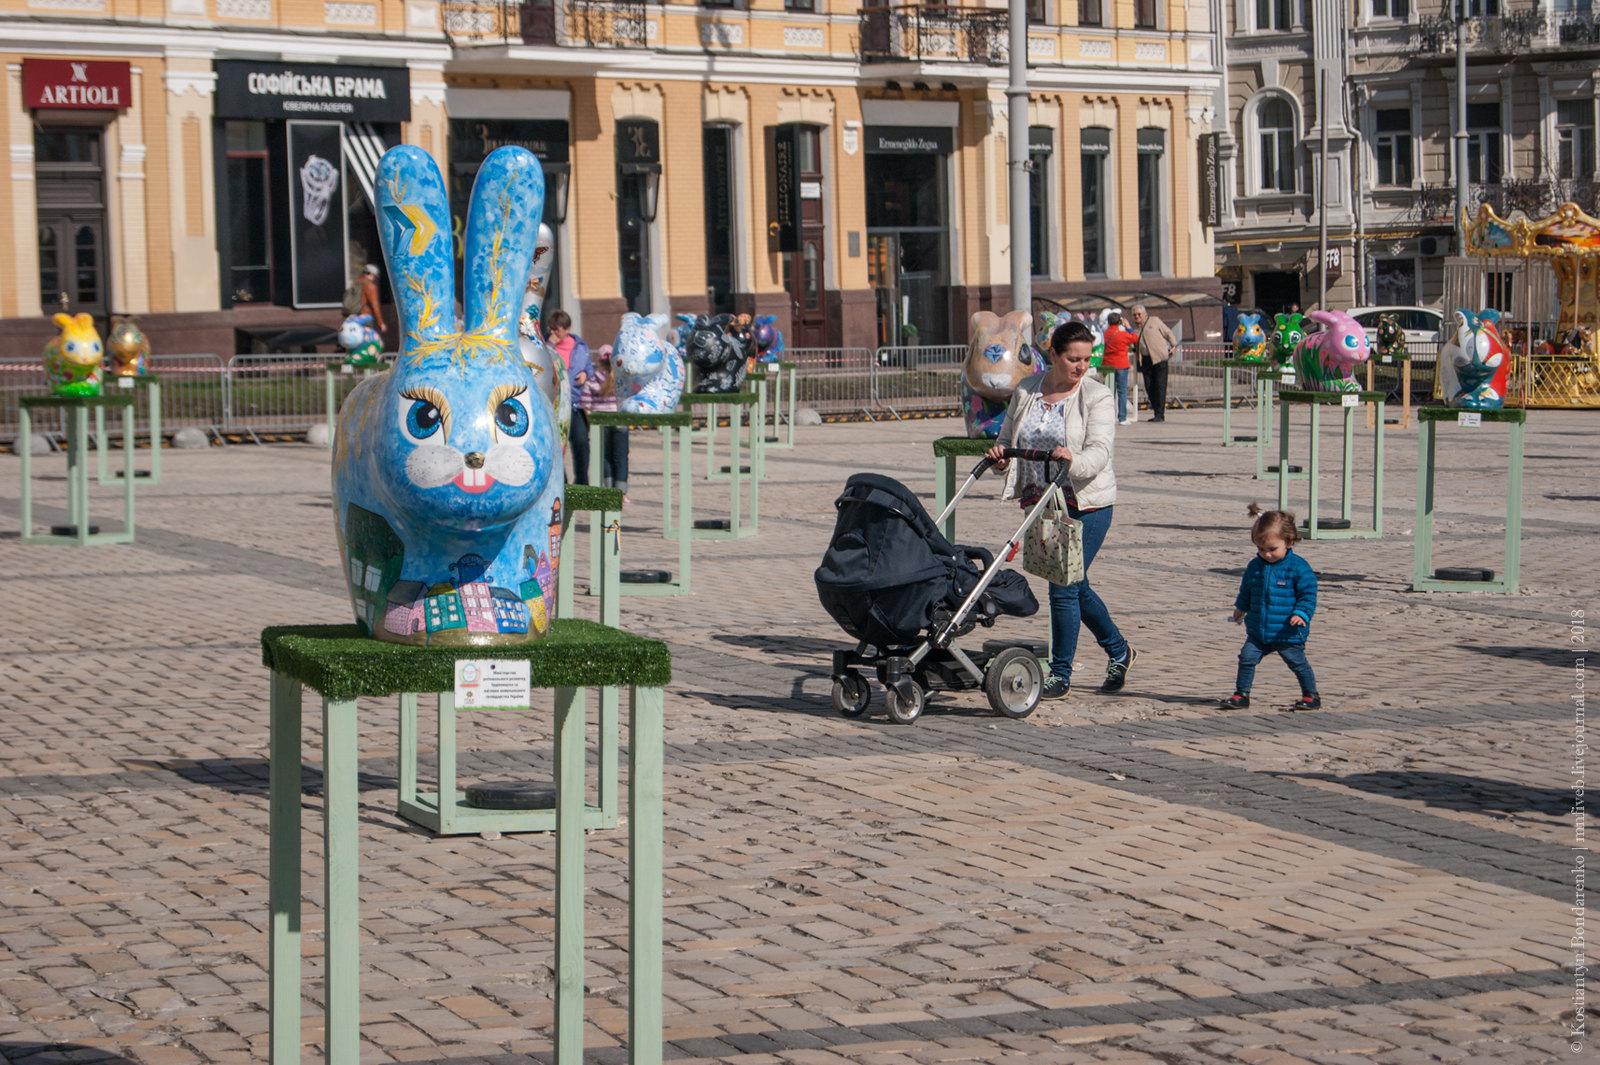 201804010 - Easter-15